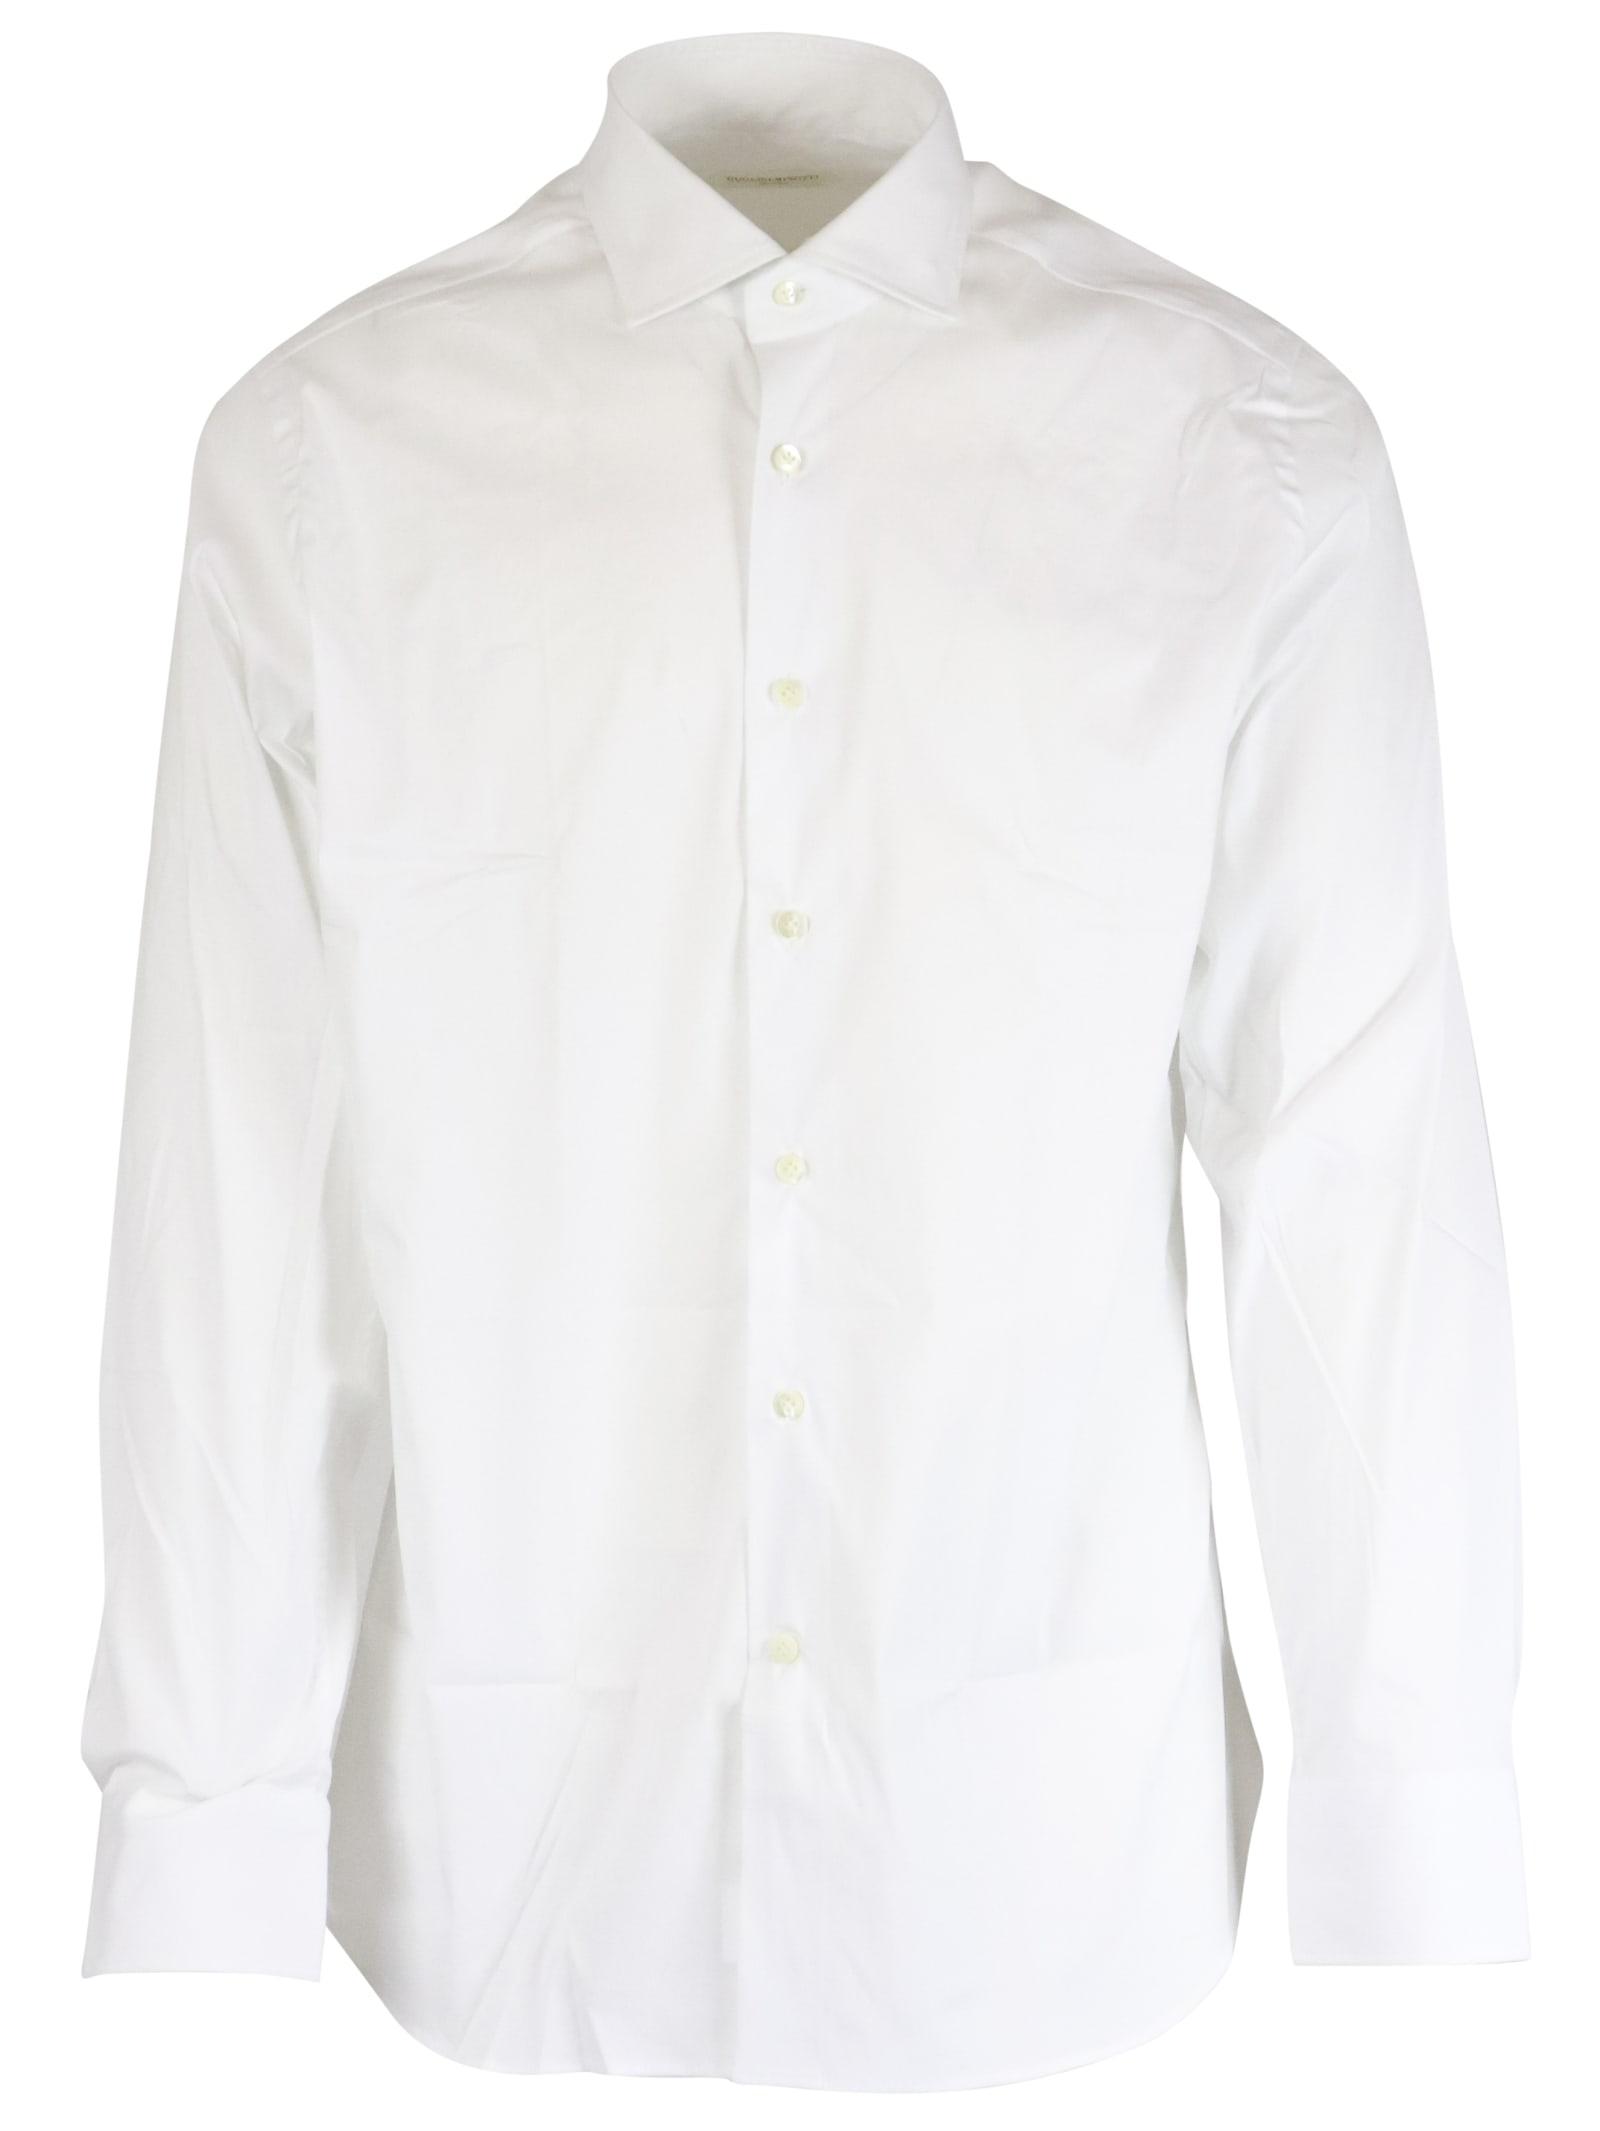 70% Cotton 27% Polyammidic 3% Elastane Shirt